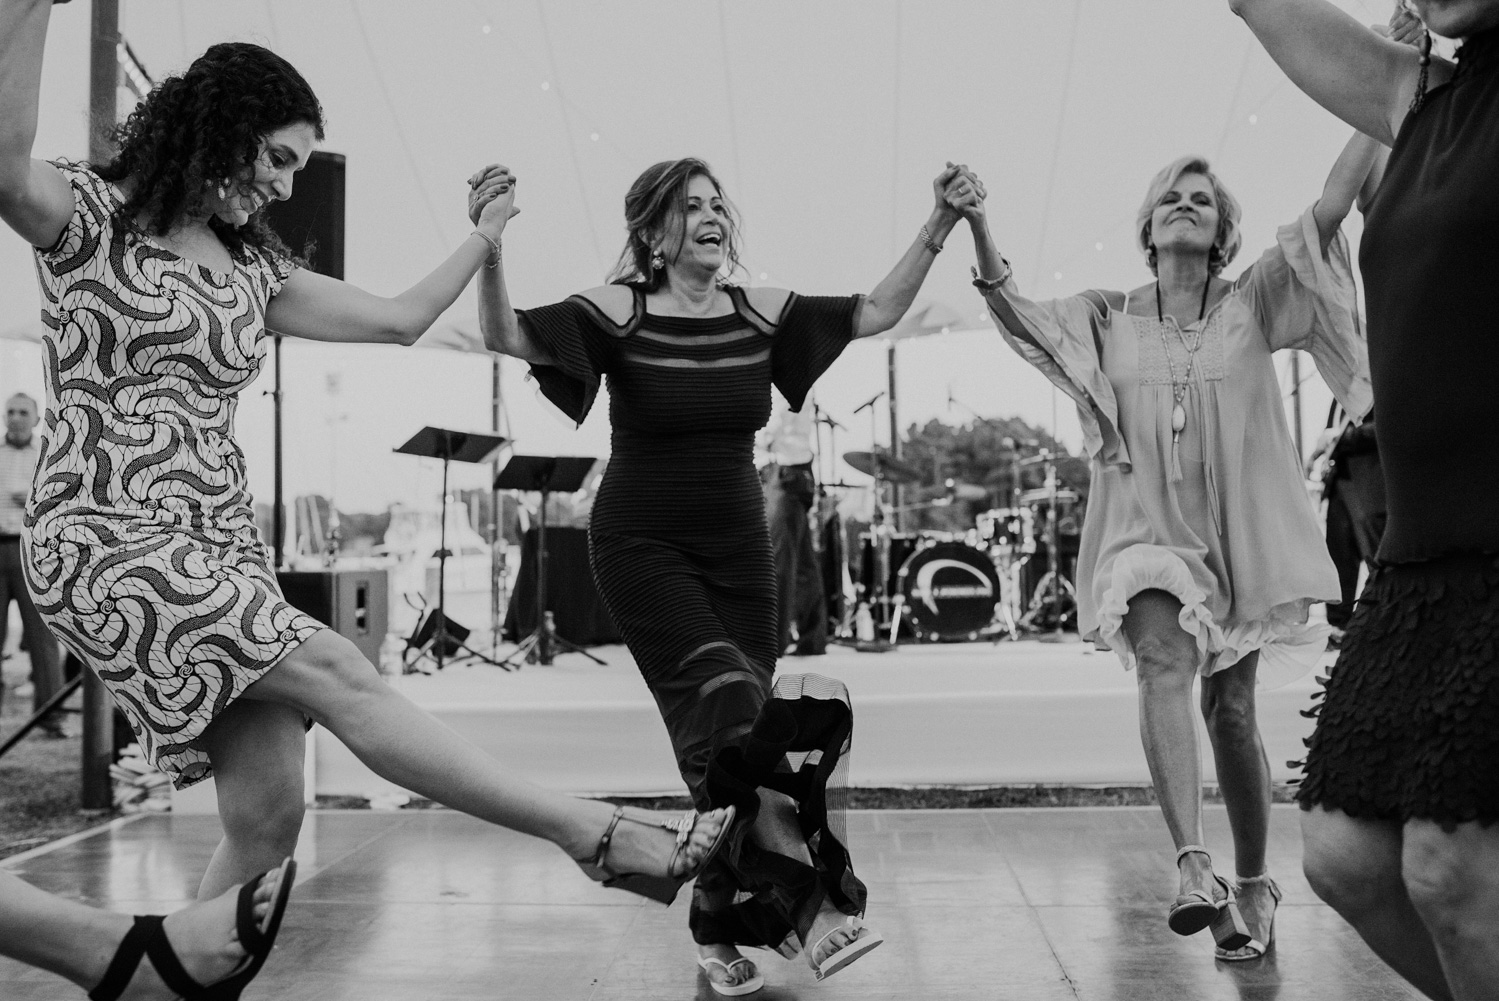 women dance during Jewish hora